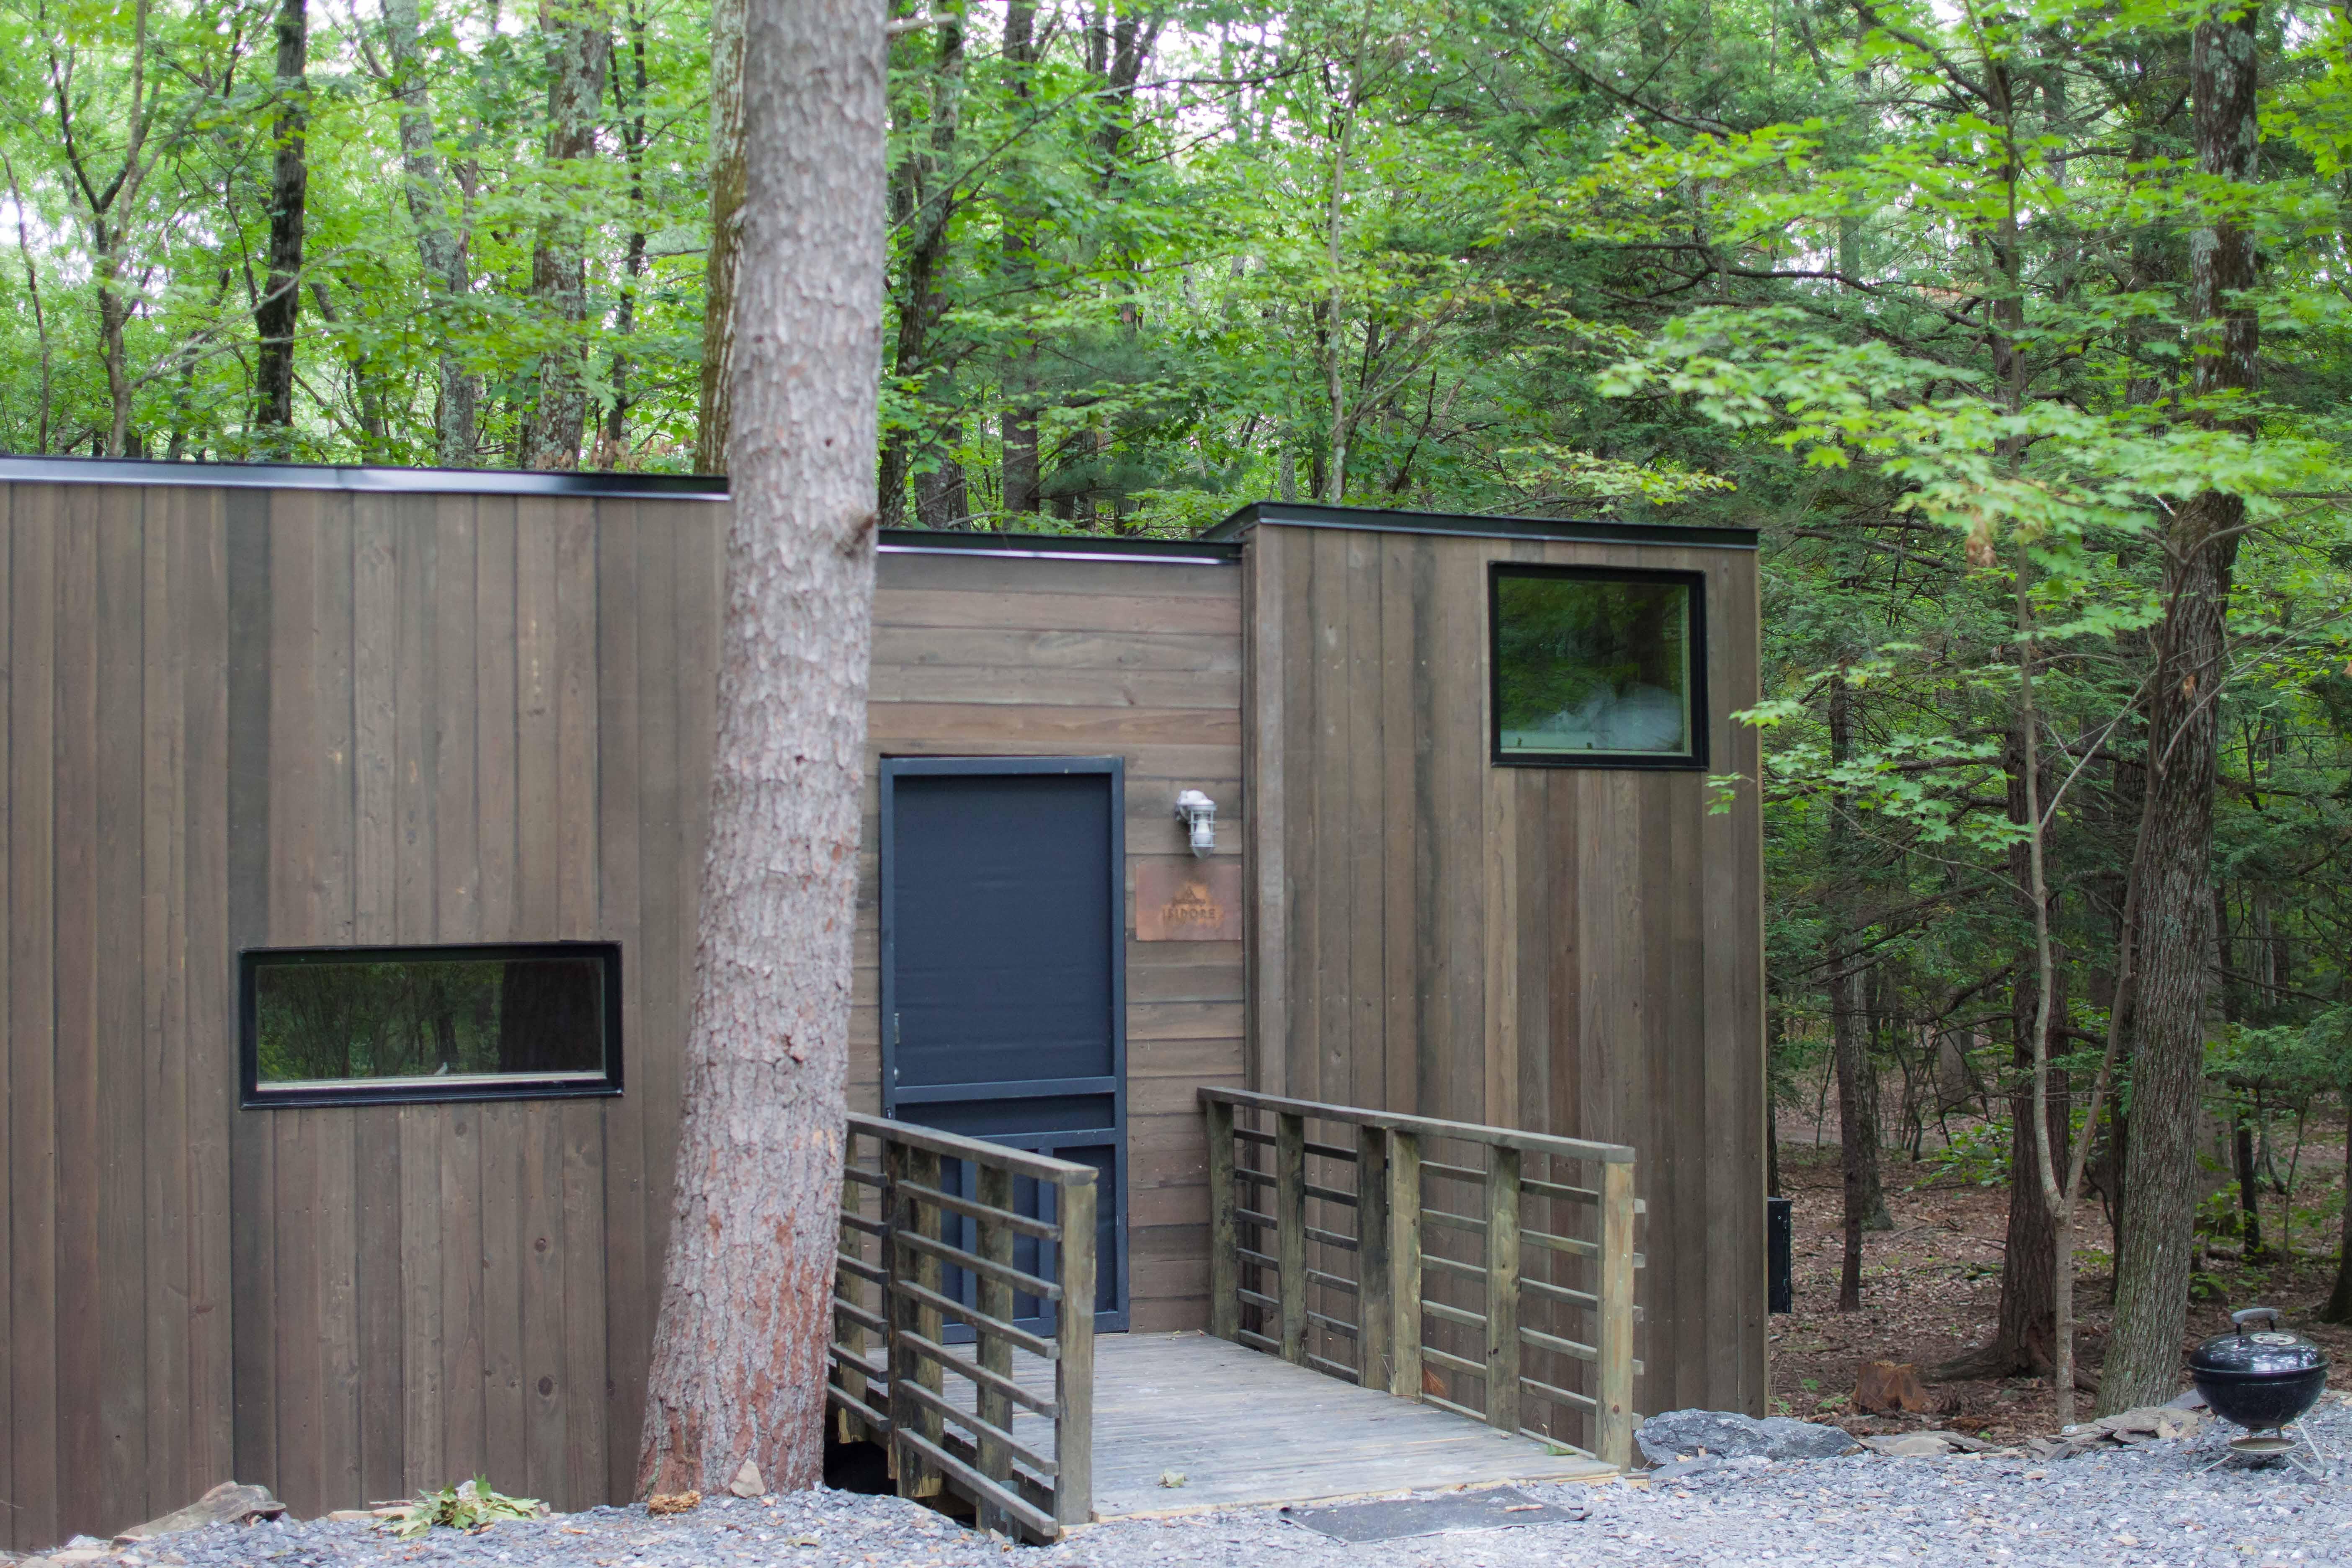 Getaway Tiny Cabins In The Catskills Werehaus